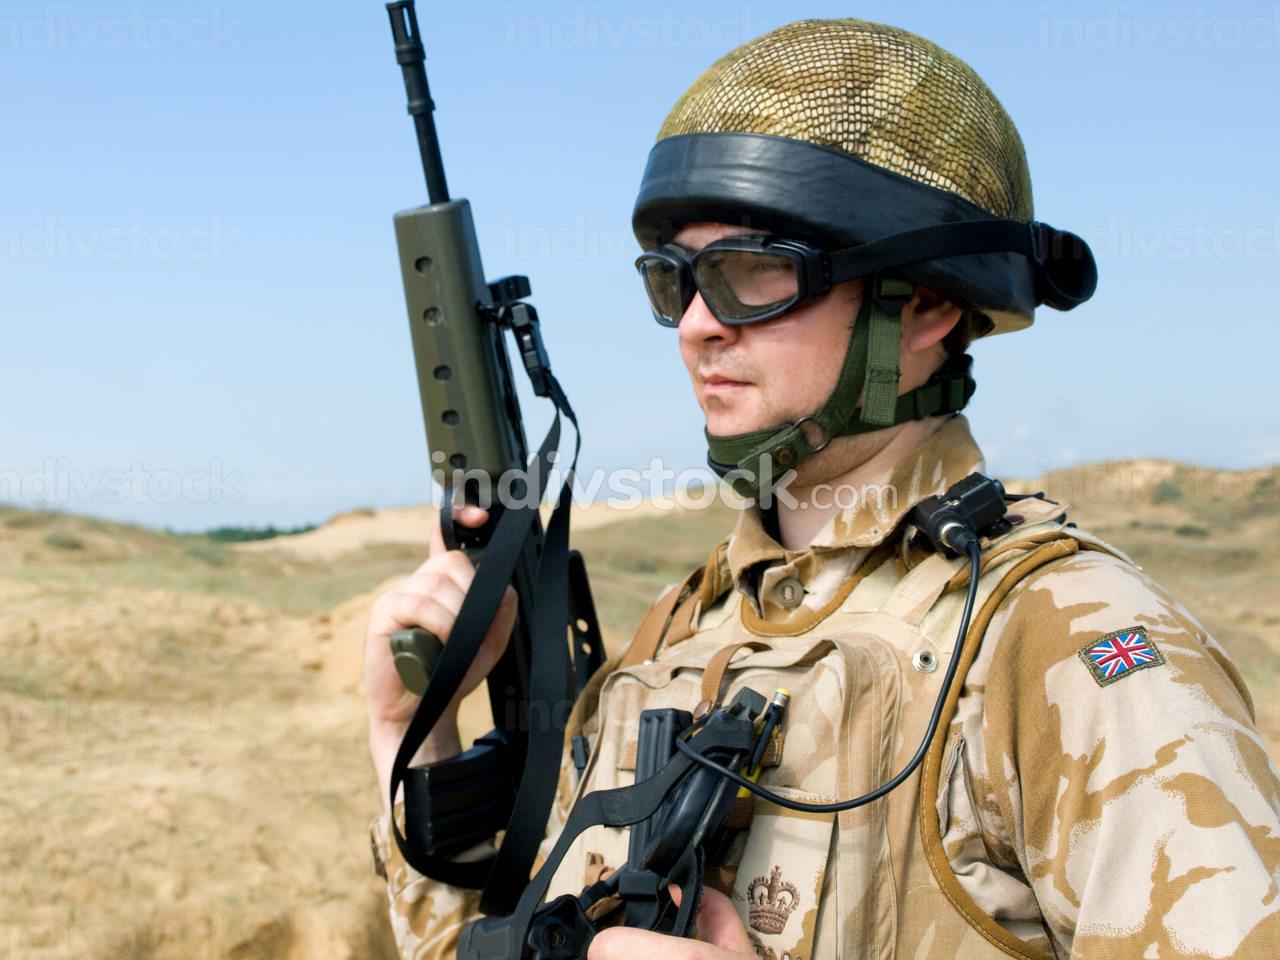 British Royal Commando in desert uniform holding his rifle